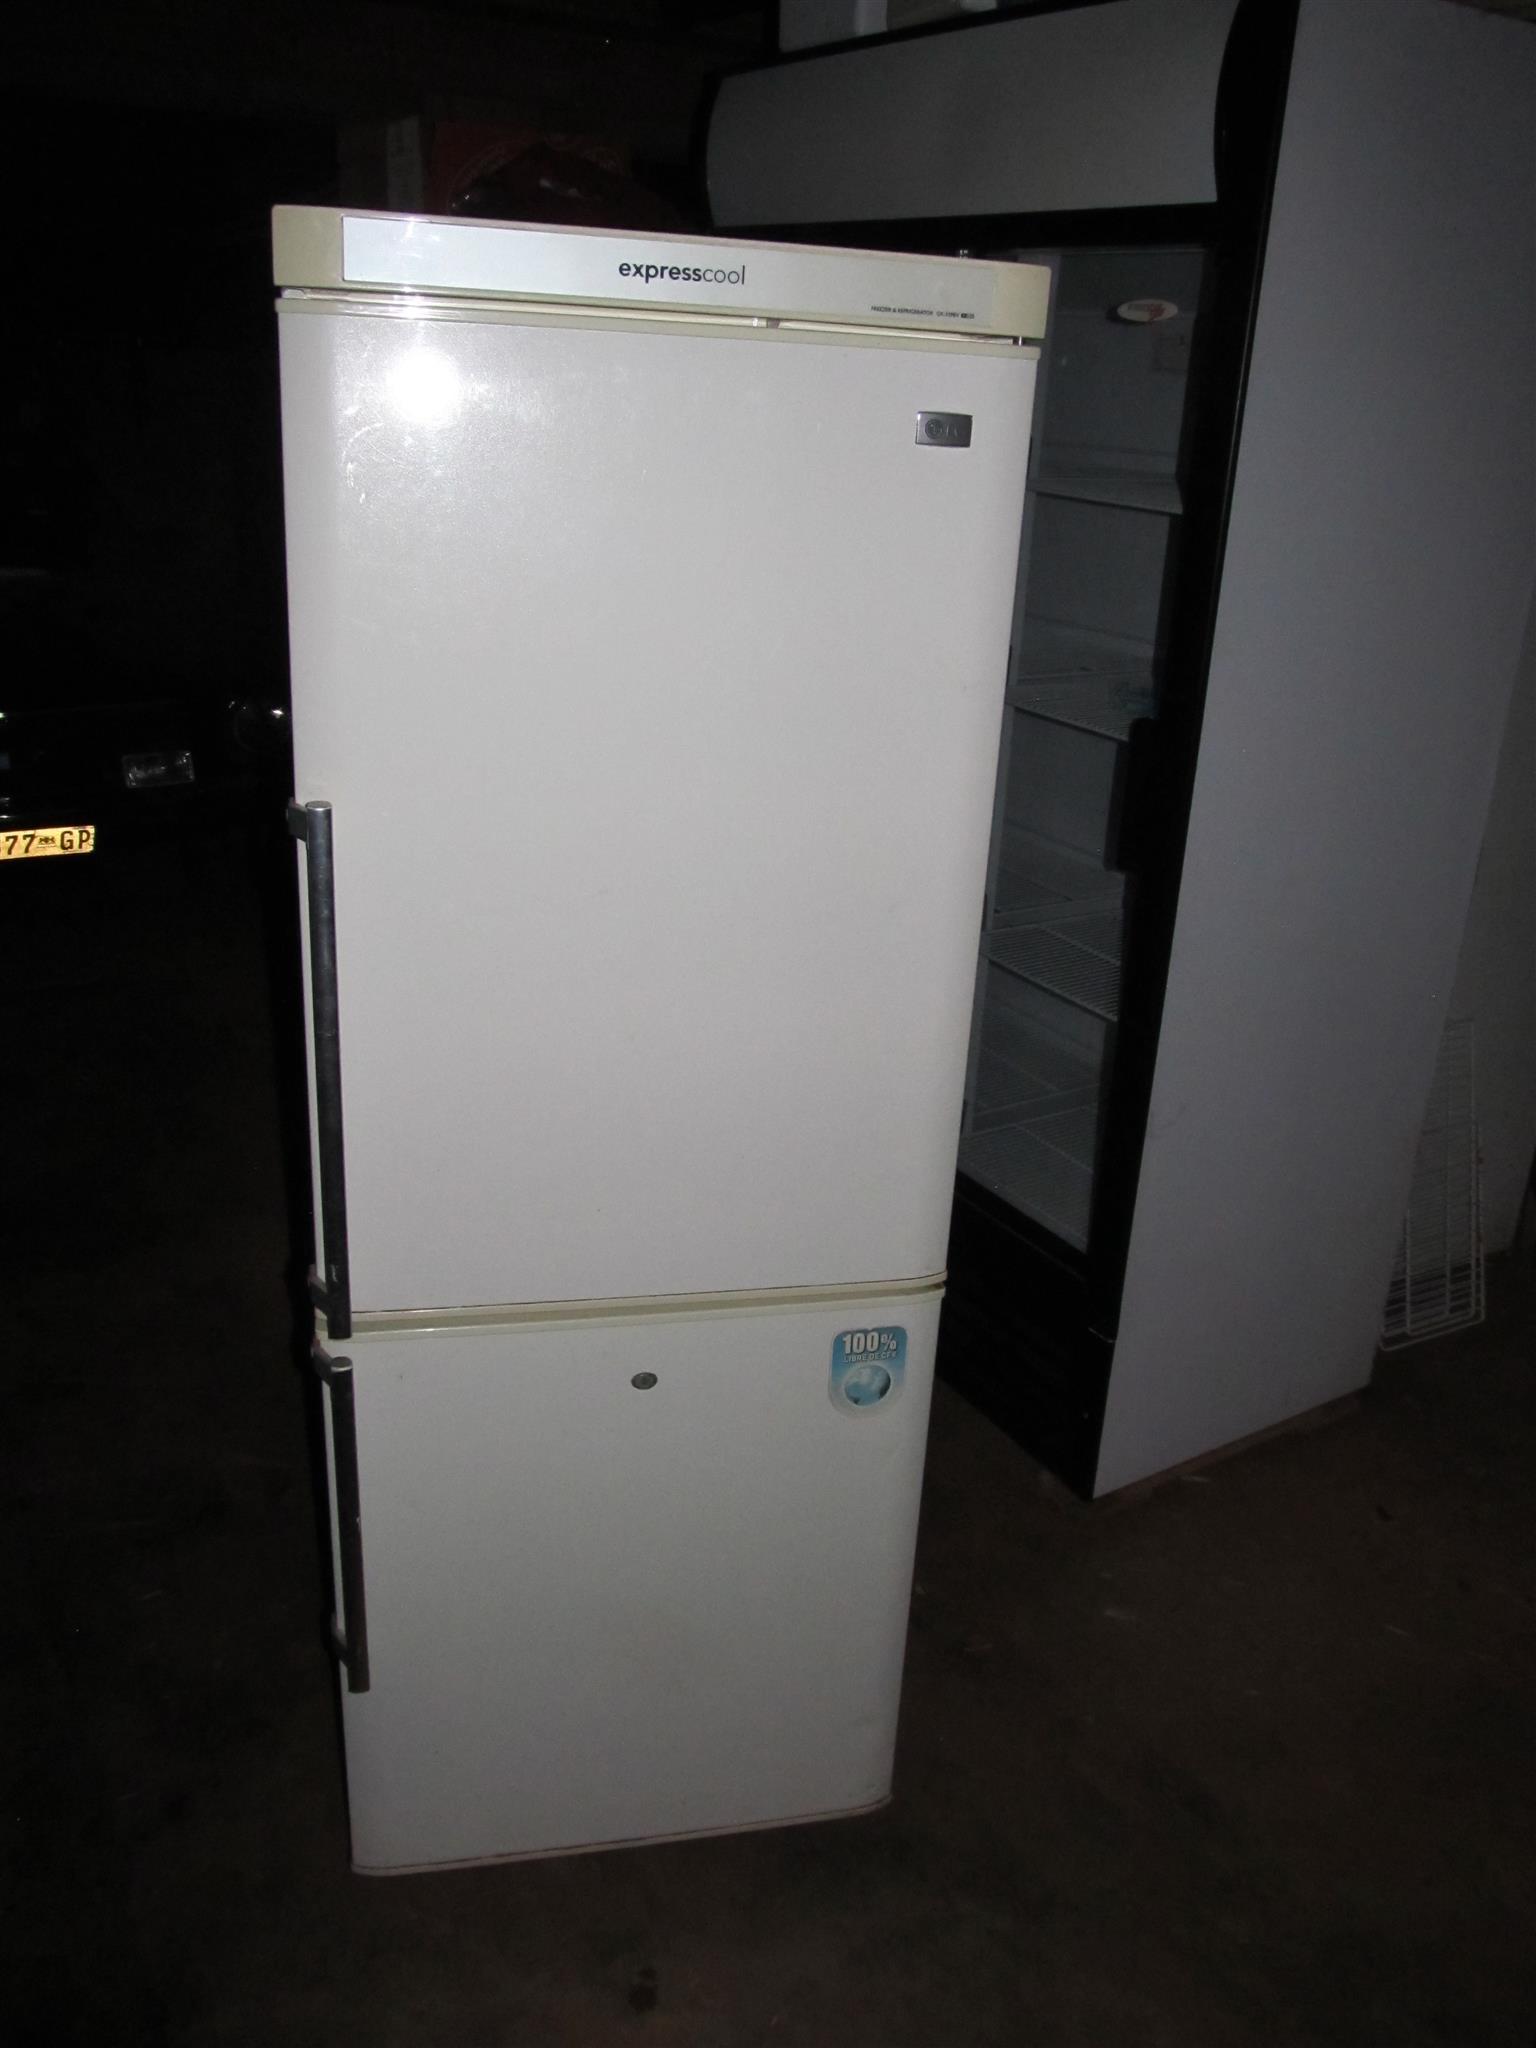 LG Expresscool Double door fridge/ freezer 260L